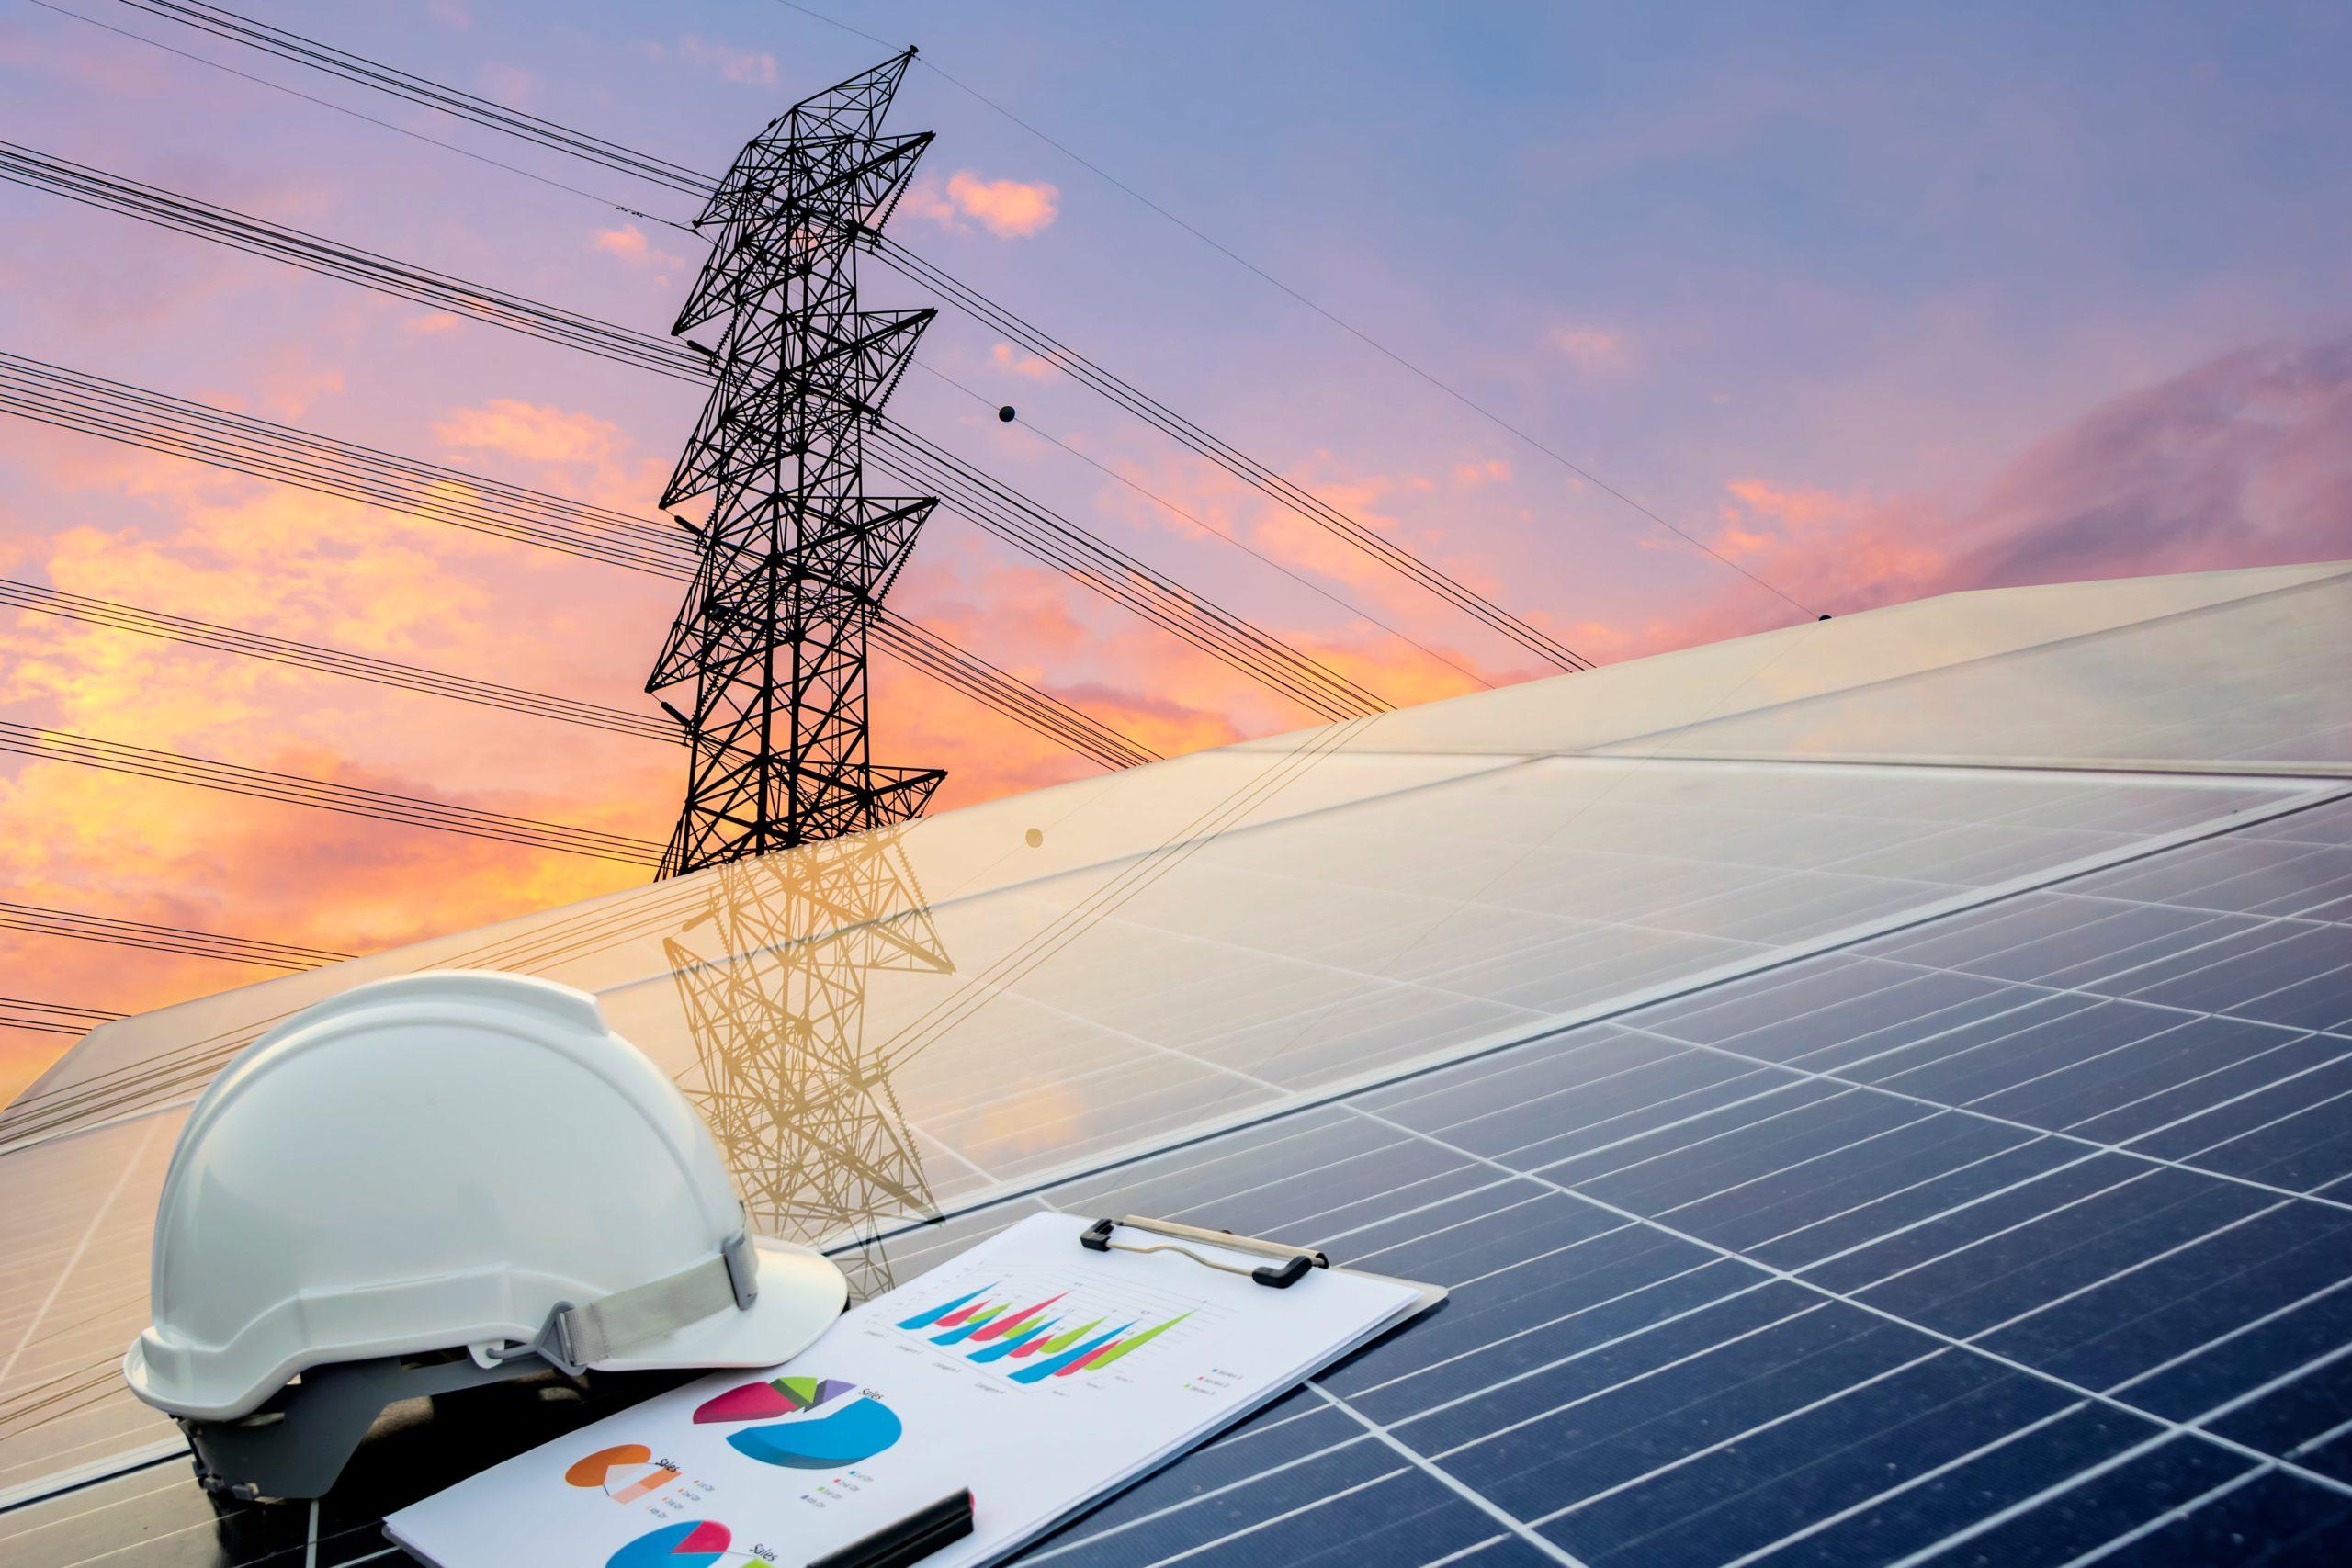 Italia al terzo posto per energia rinnovabile